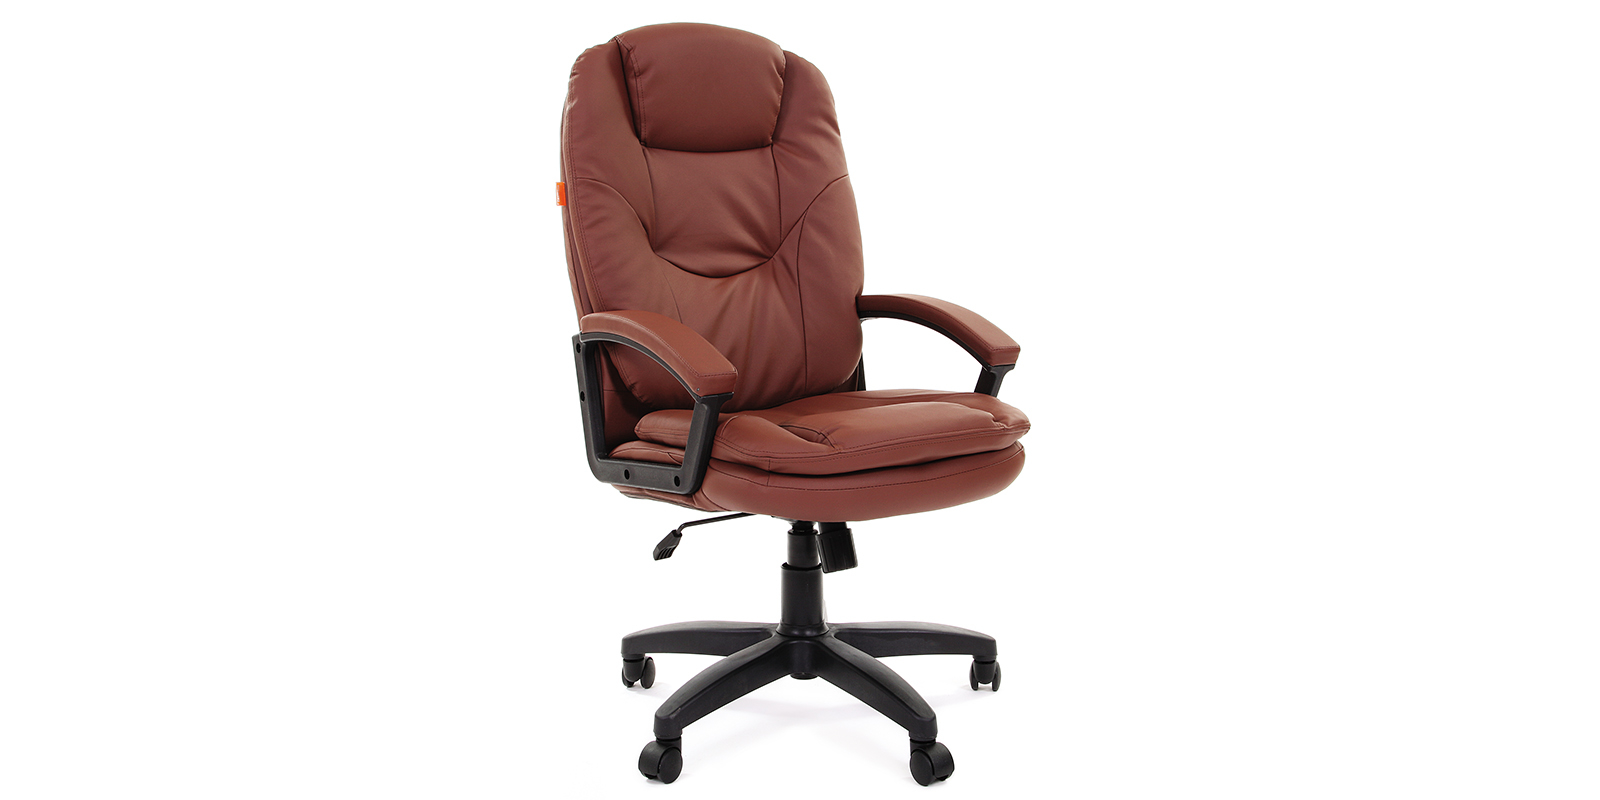 Chairman 668 LT вариант №2 (коричневый)